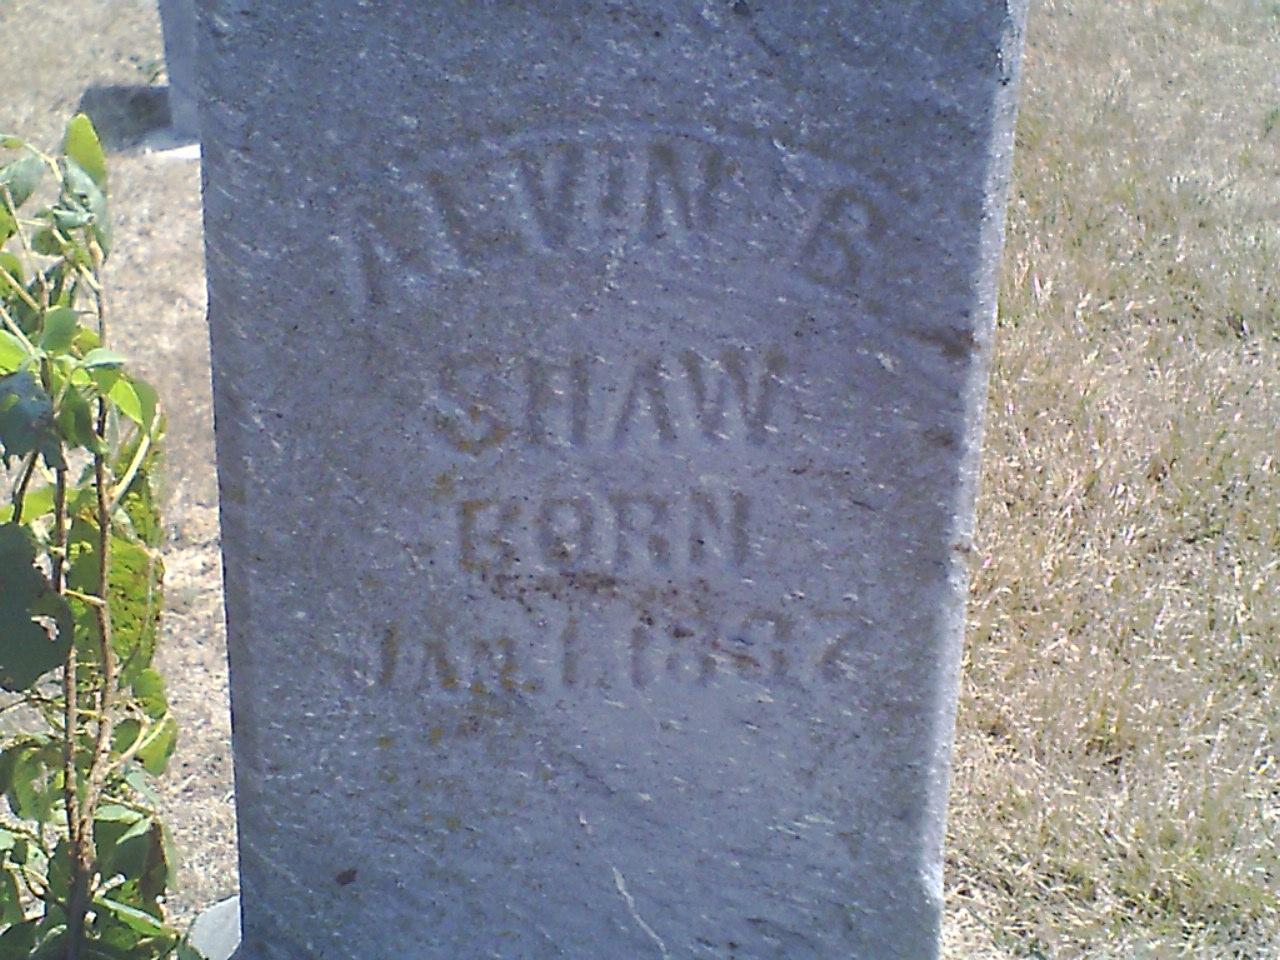 Alvin B. Shaw